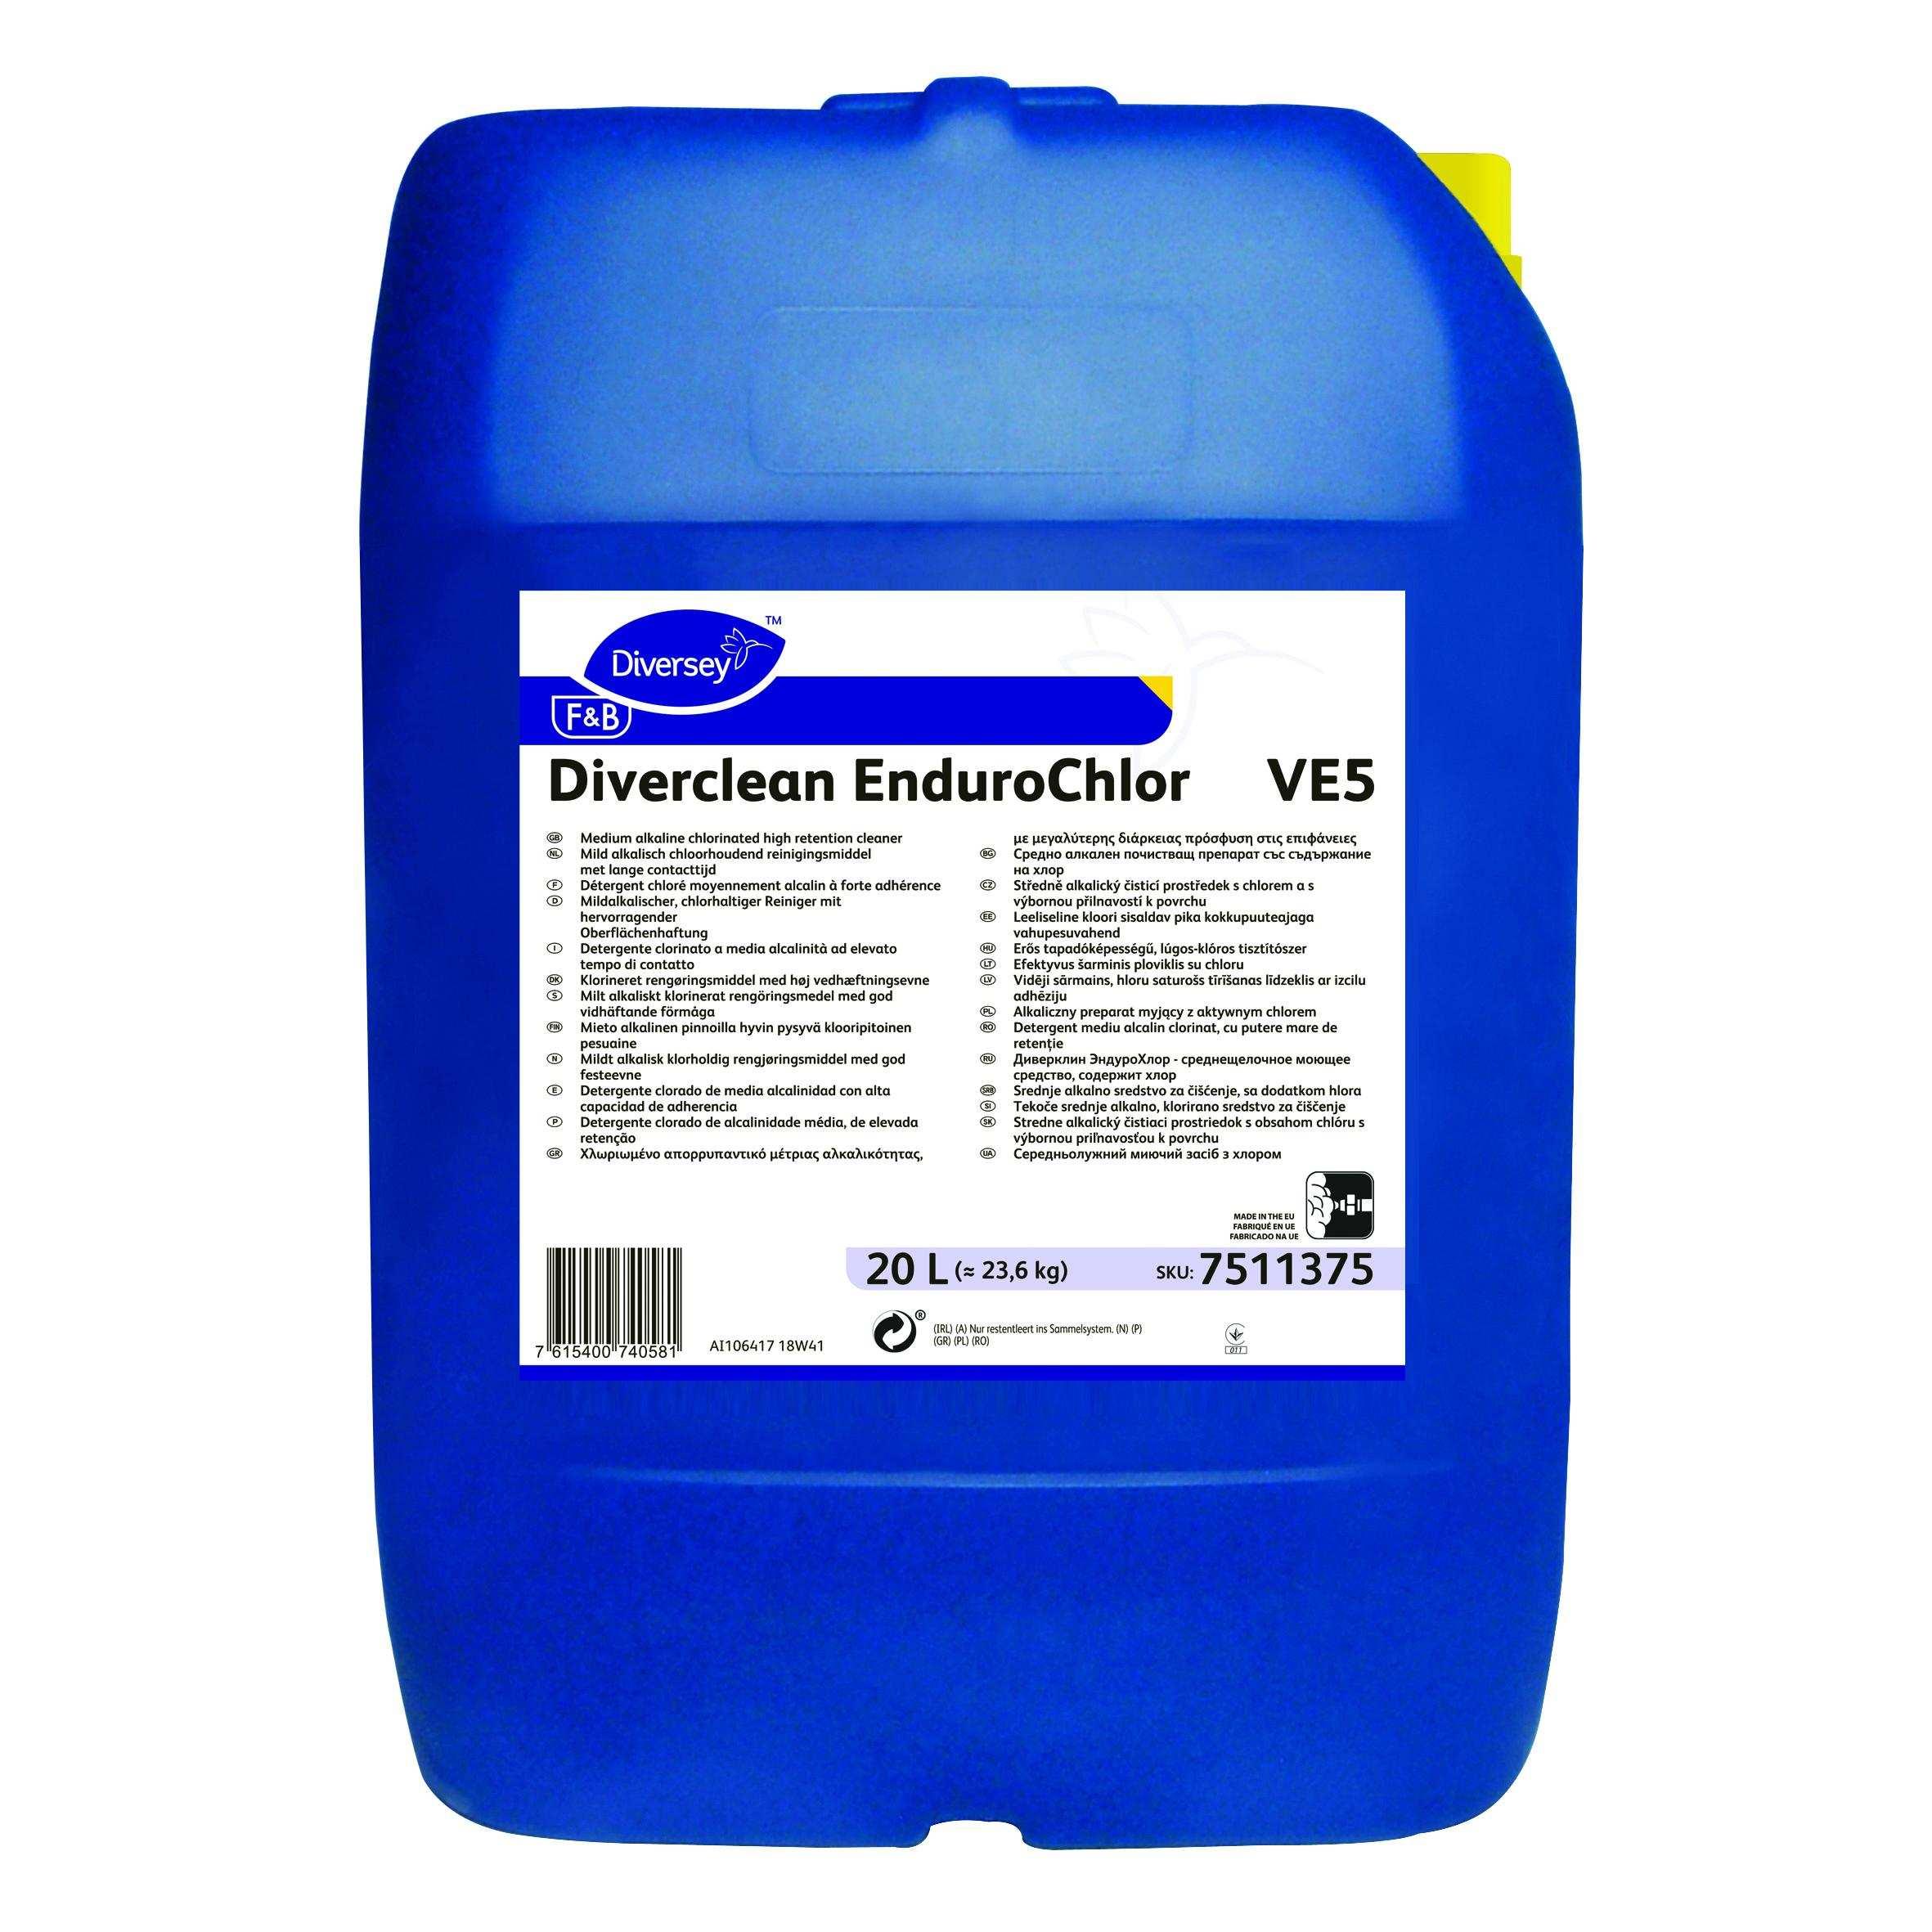 7511375-Diverclean-EnduroChlor-VE5-20L.jpg